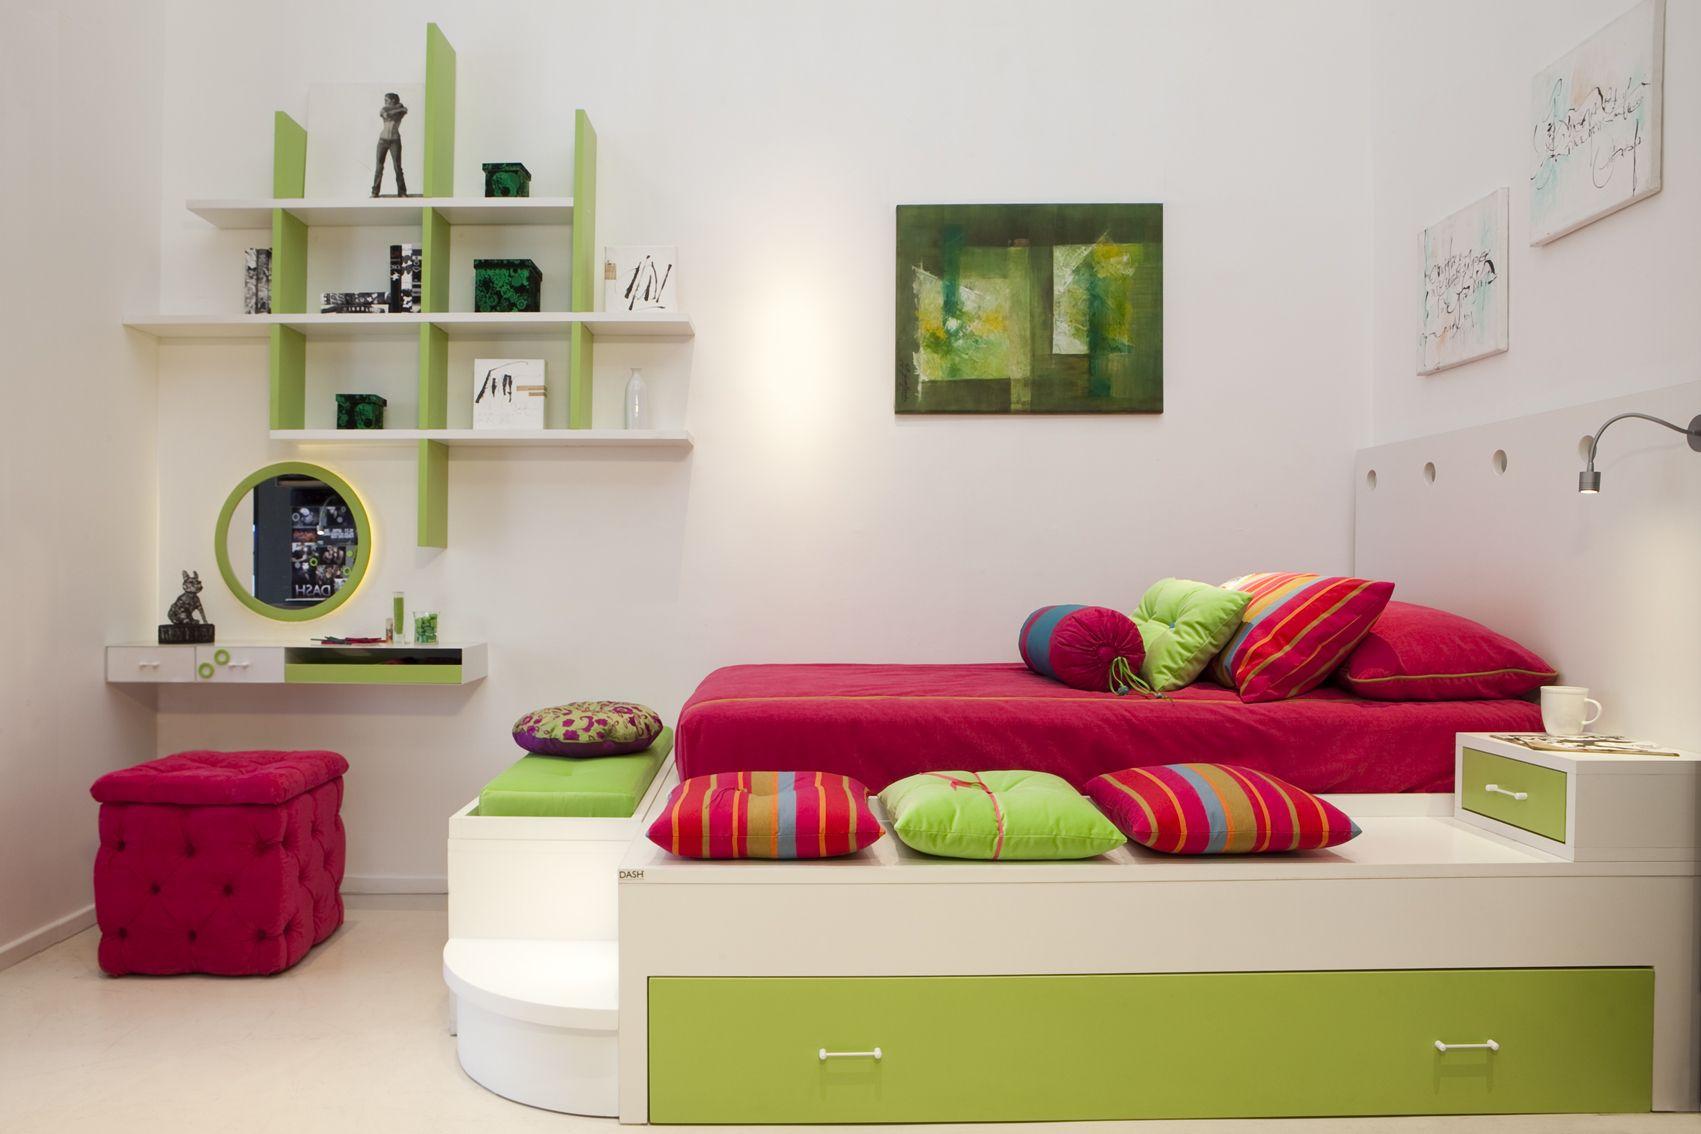 Muebles Dash Juveniles - Girly Bedroom Design By Dash Www Proyectodash Com Ar Dash [mjhdah]http://www.cerilene.com/i/2017/09/escritorios-juveniles-chile-bajo-ventana-modernos-argentina-dash.jpg